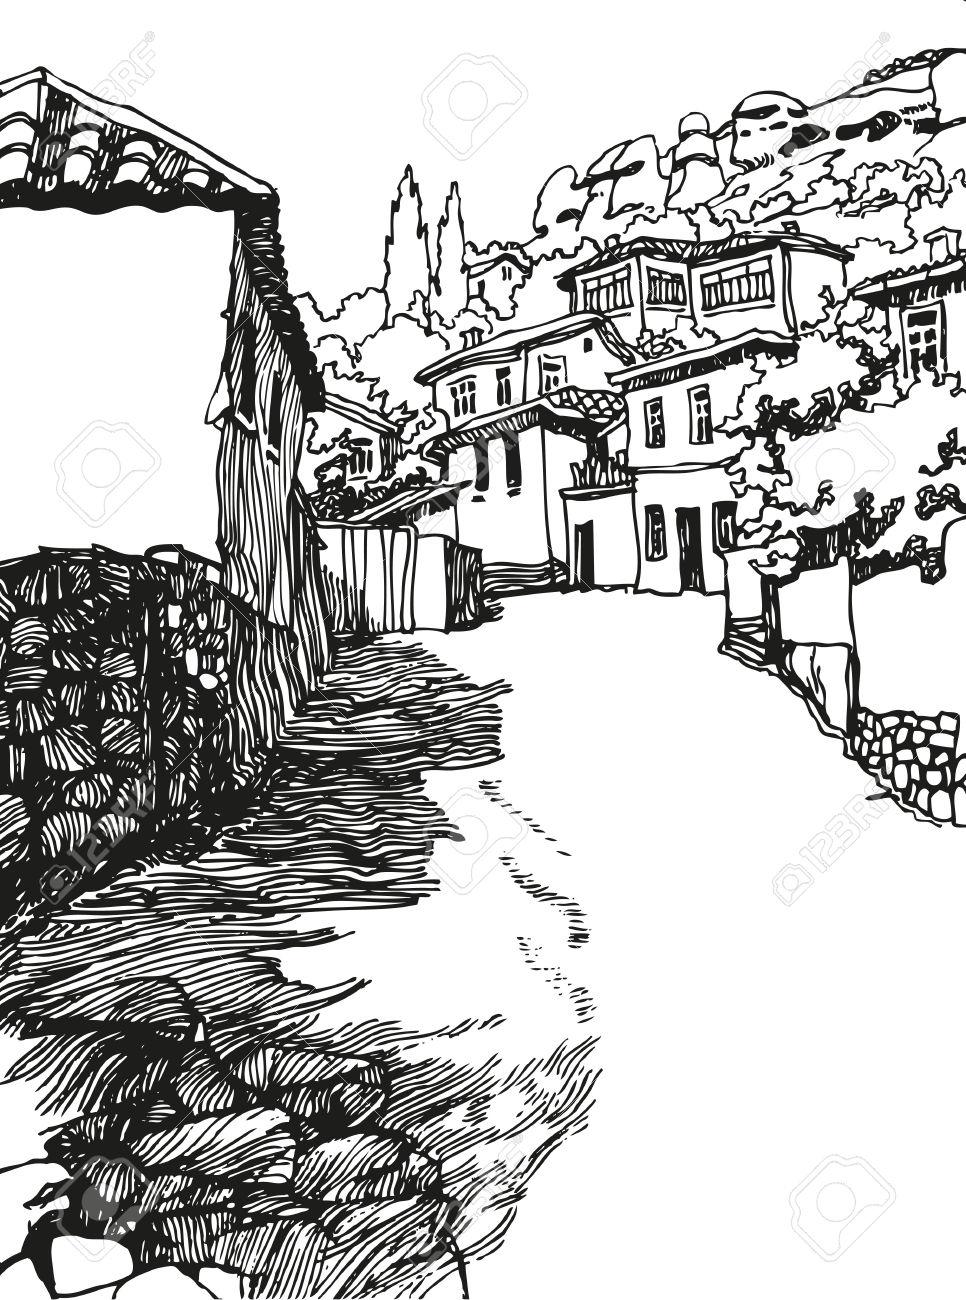 966x1300 Black White Landscape Drawings Illustration Of The Black